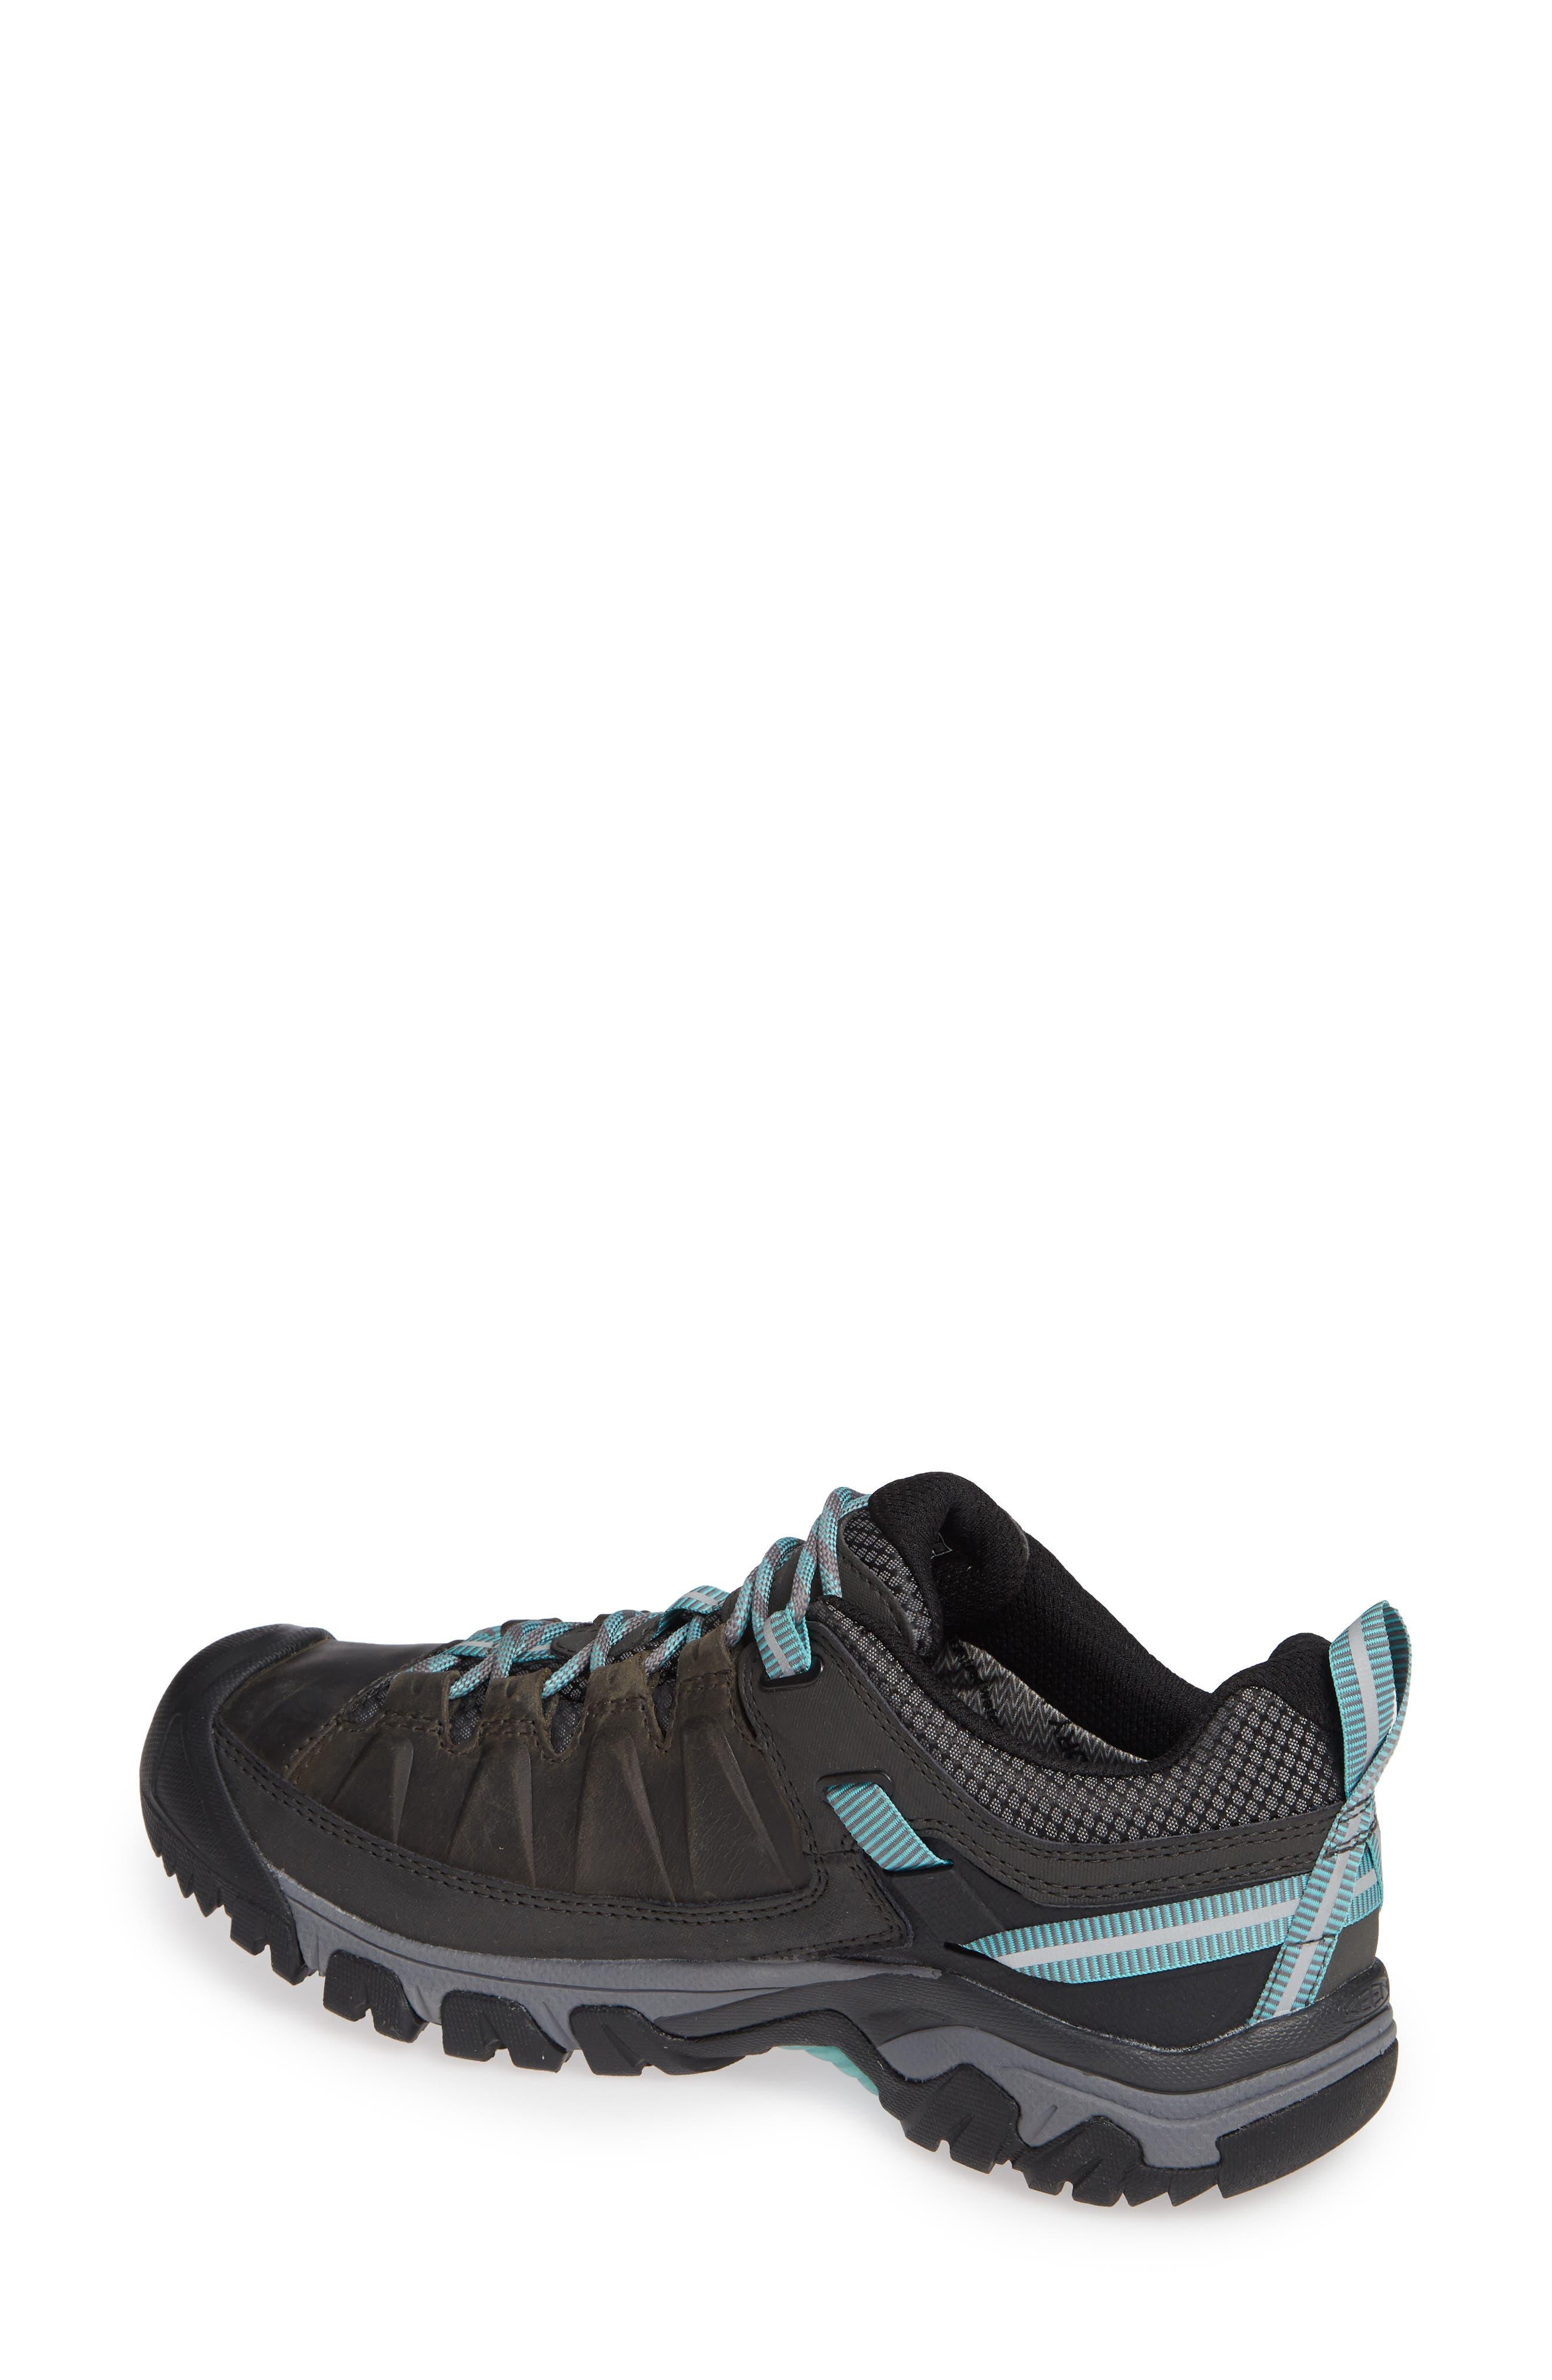 Targhee III Waterproof Hiking Shoe,                             Alternate thumbnail 2, color,                             ALCATRAZ/ TURQUOISE LEATHER